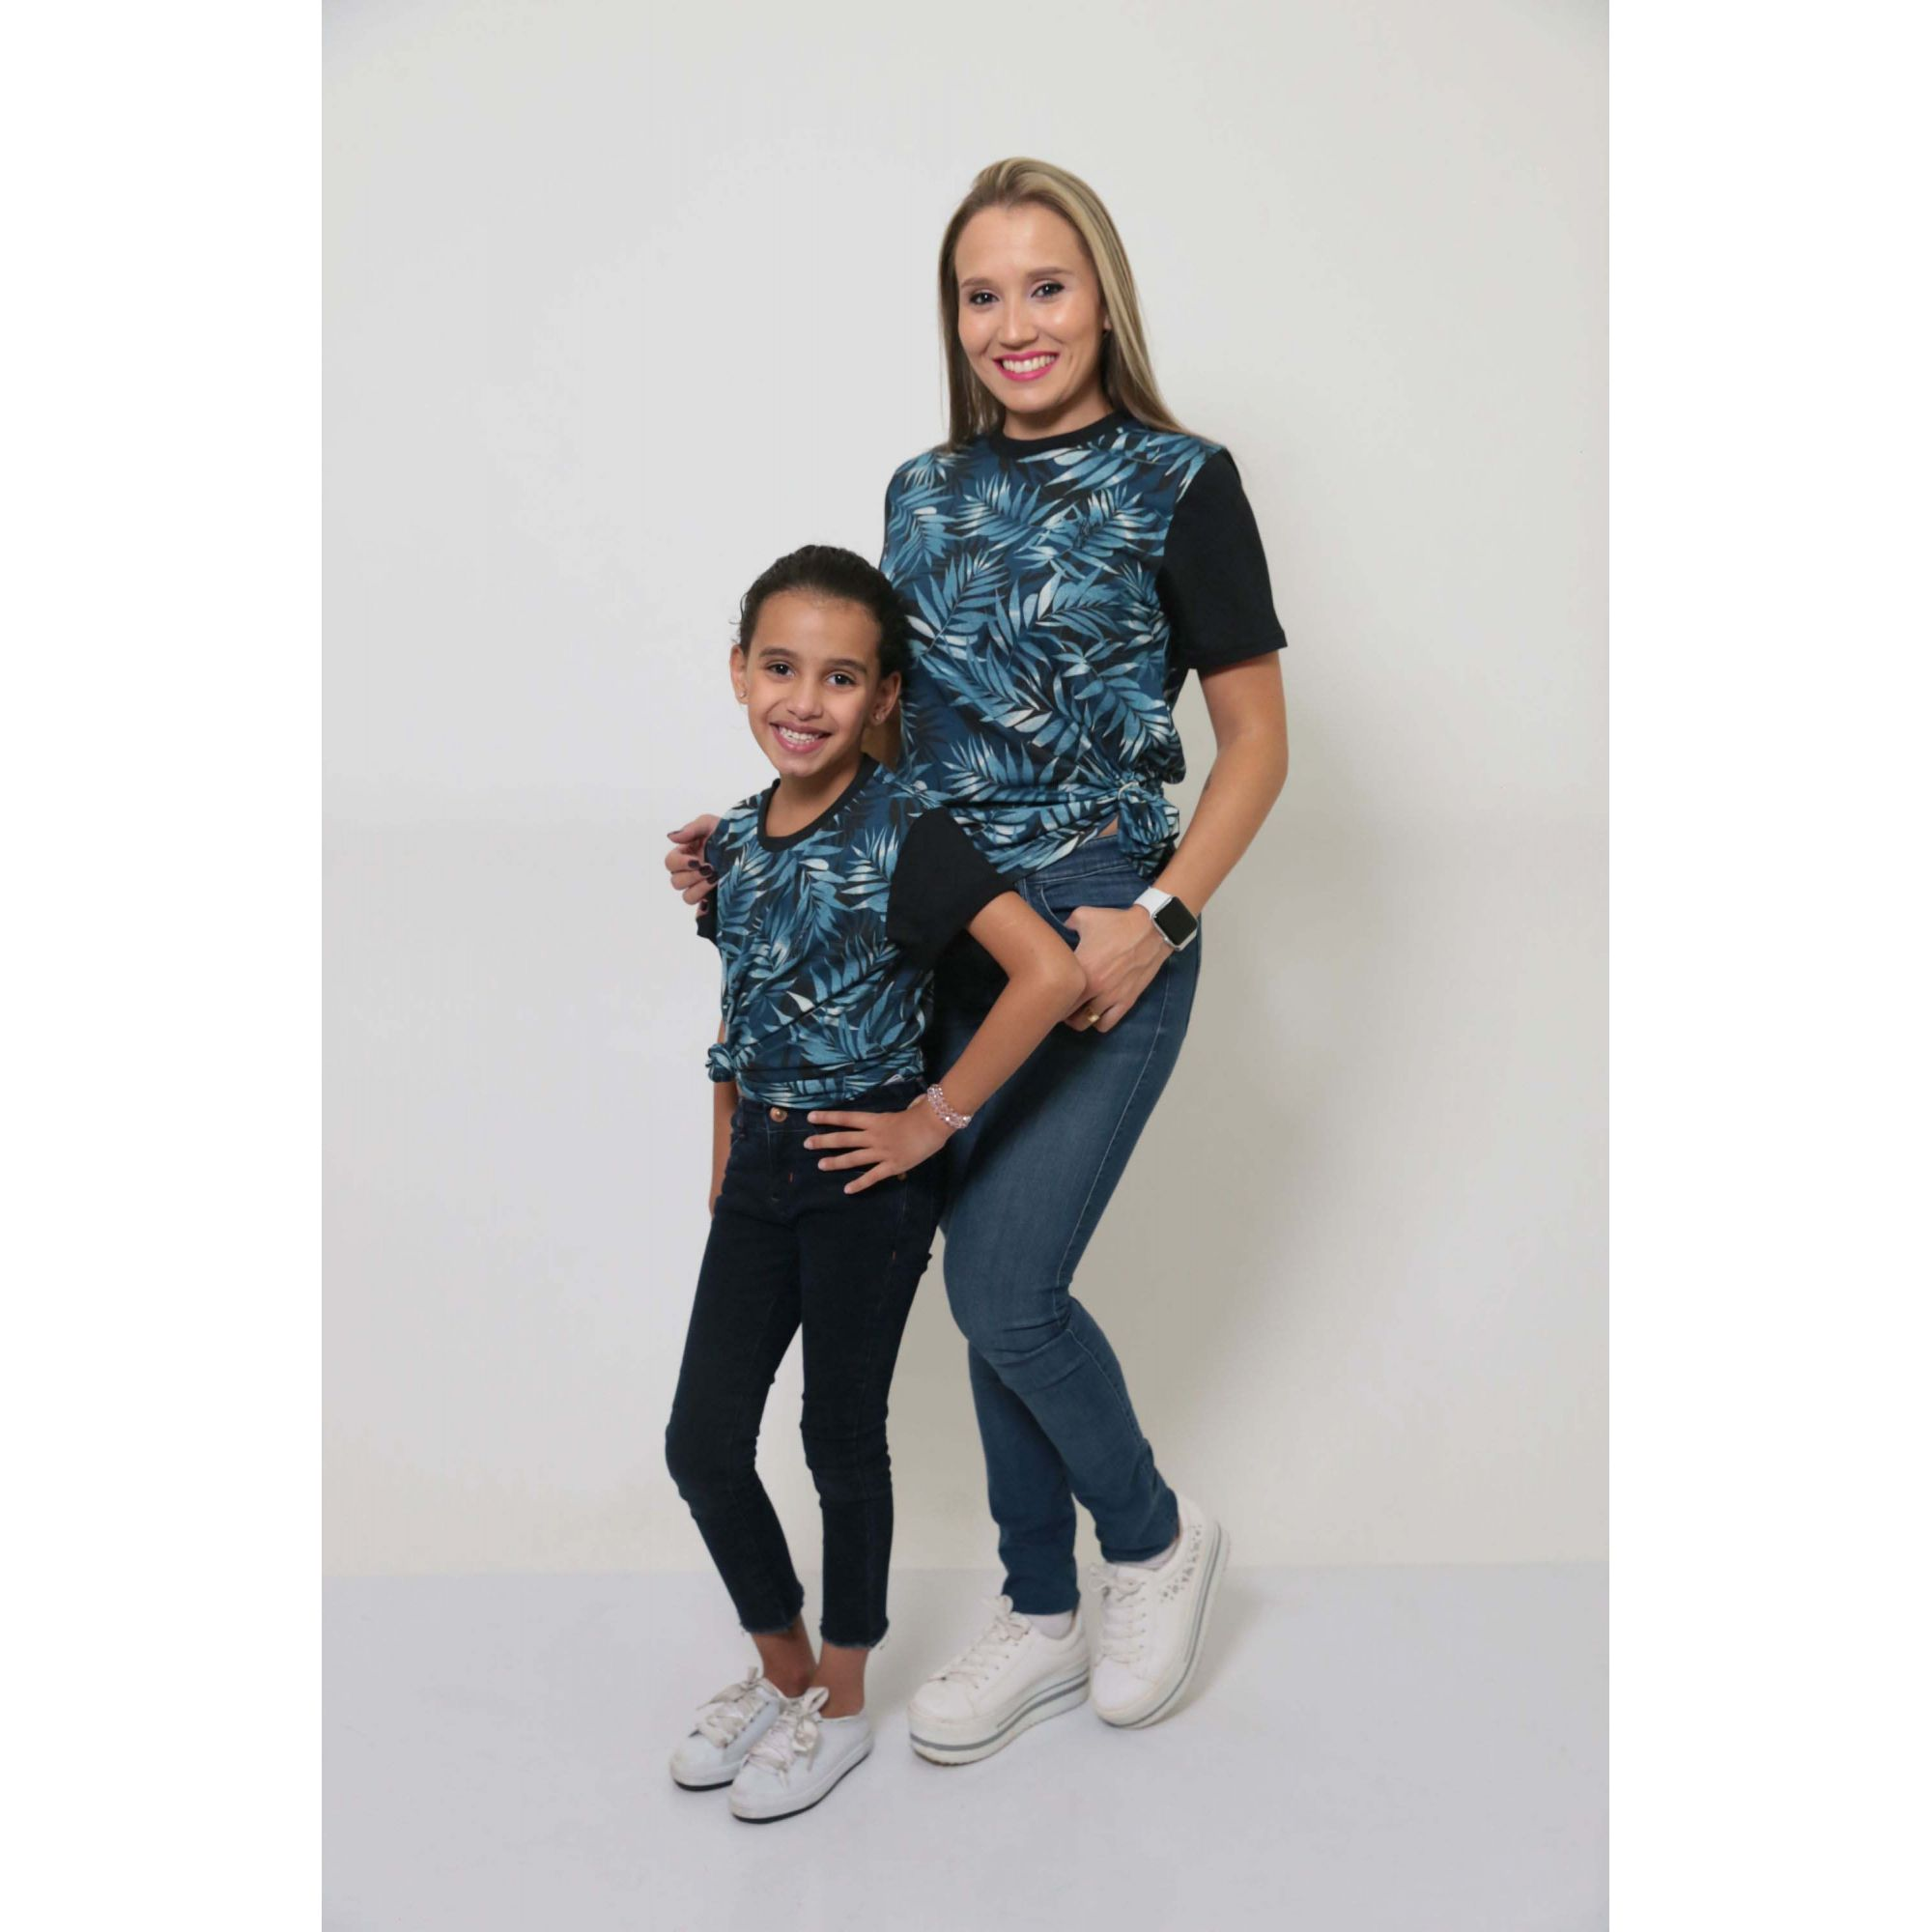 MÃE E FILHA > Kit 02 Peças T-Shirts - Tropical Unissex [Coleção Tal Mãe Tal Filha]  - Heitor Fashion Brazil